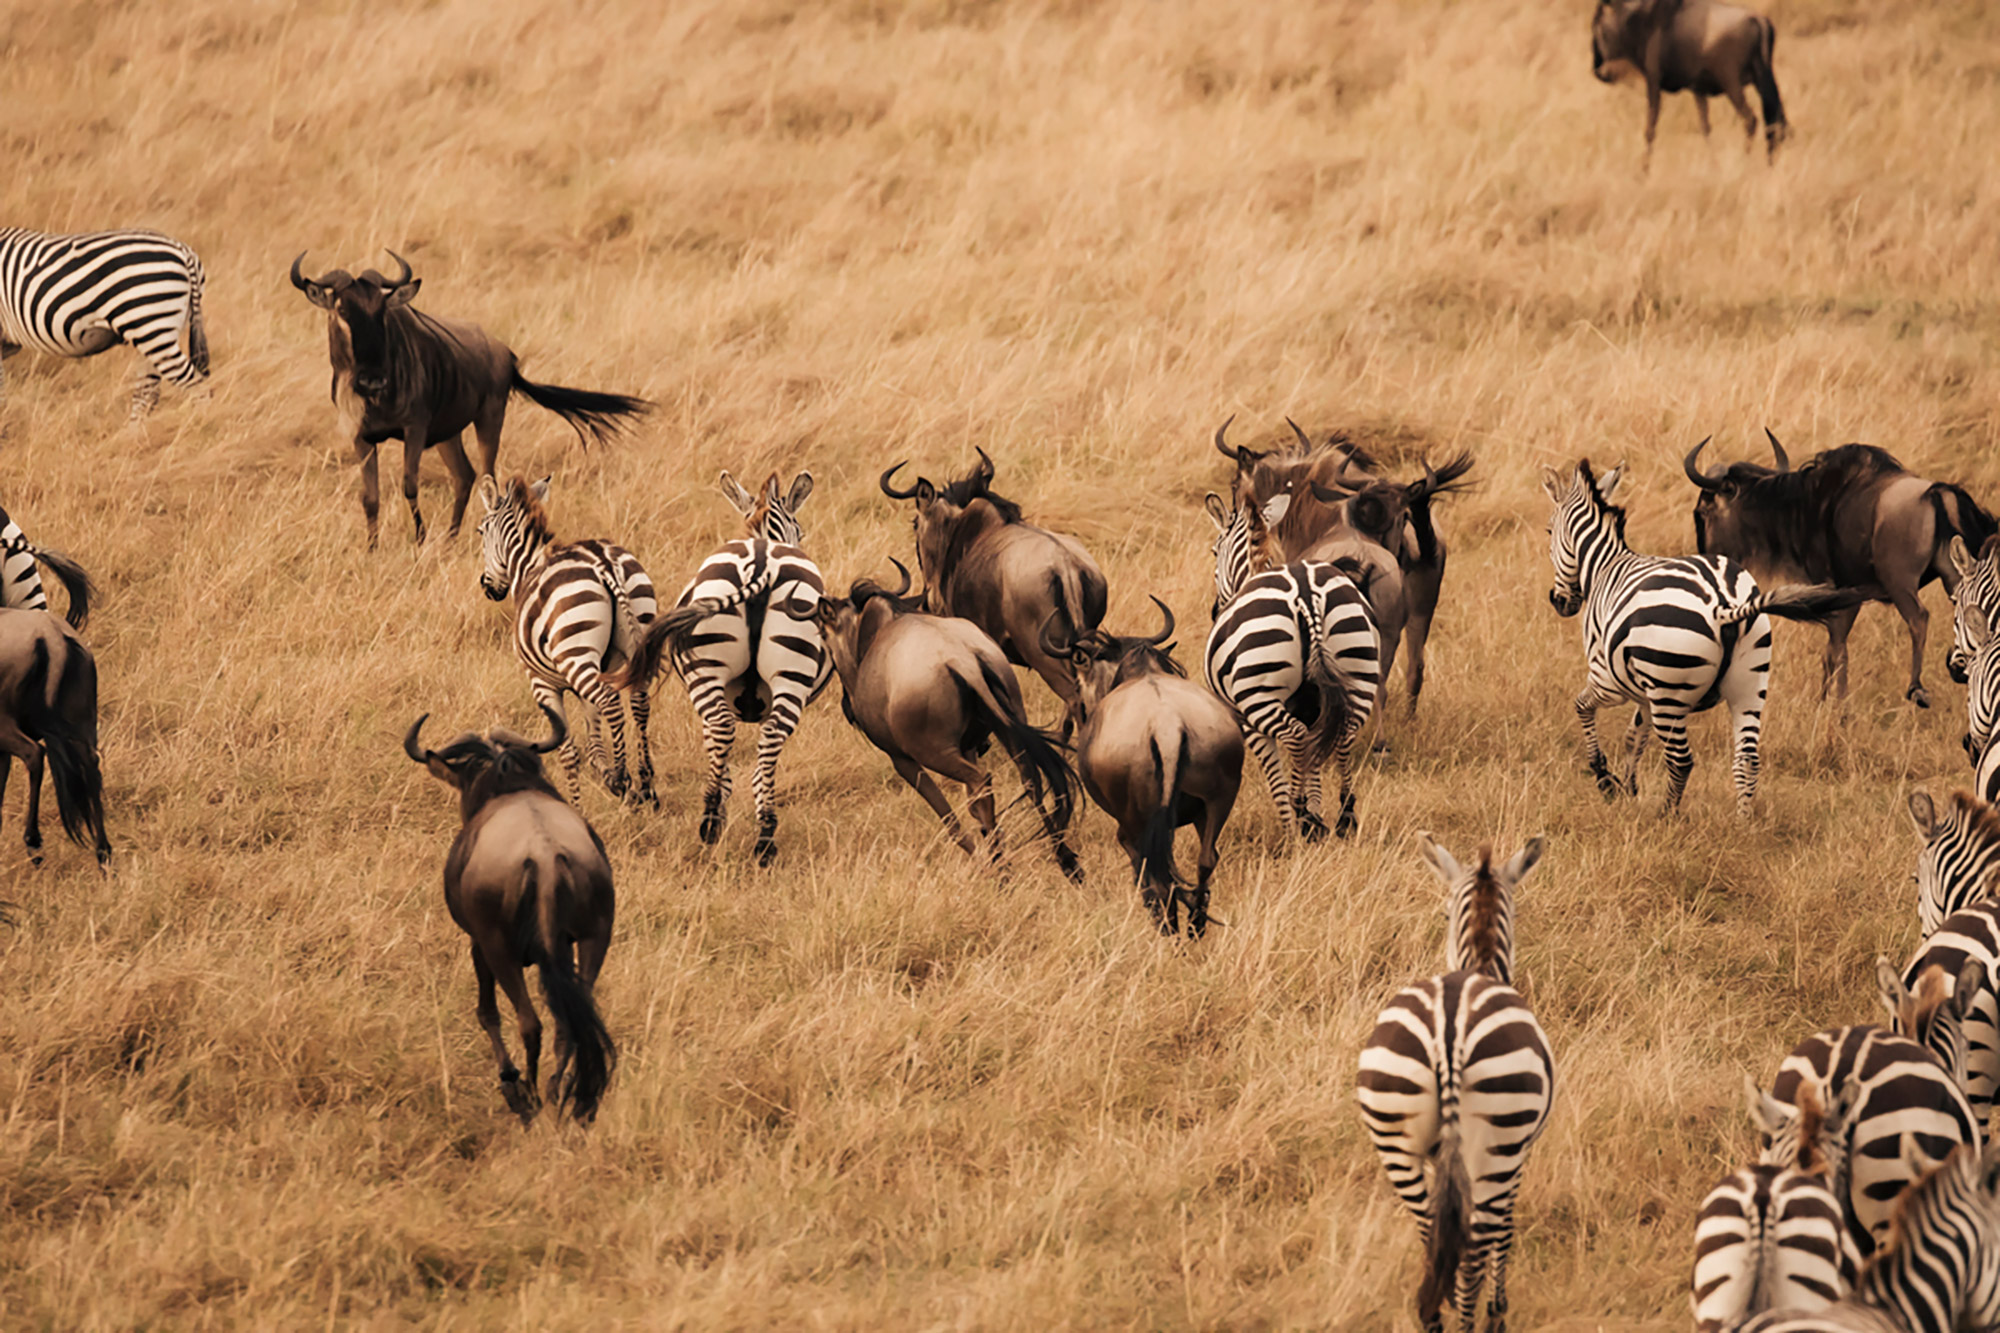 APitts_Condor_Kenya_137-2.jpg